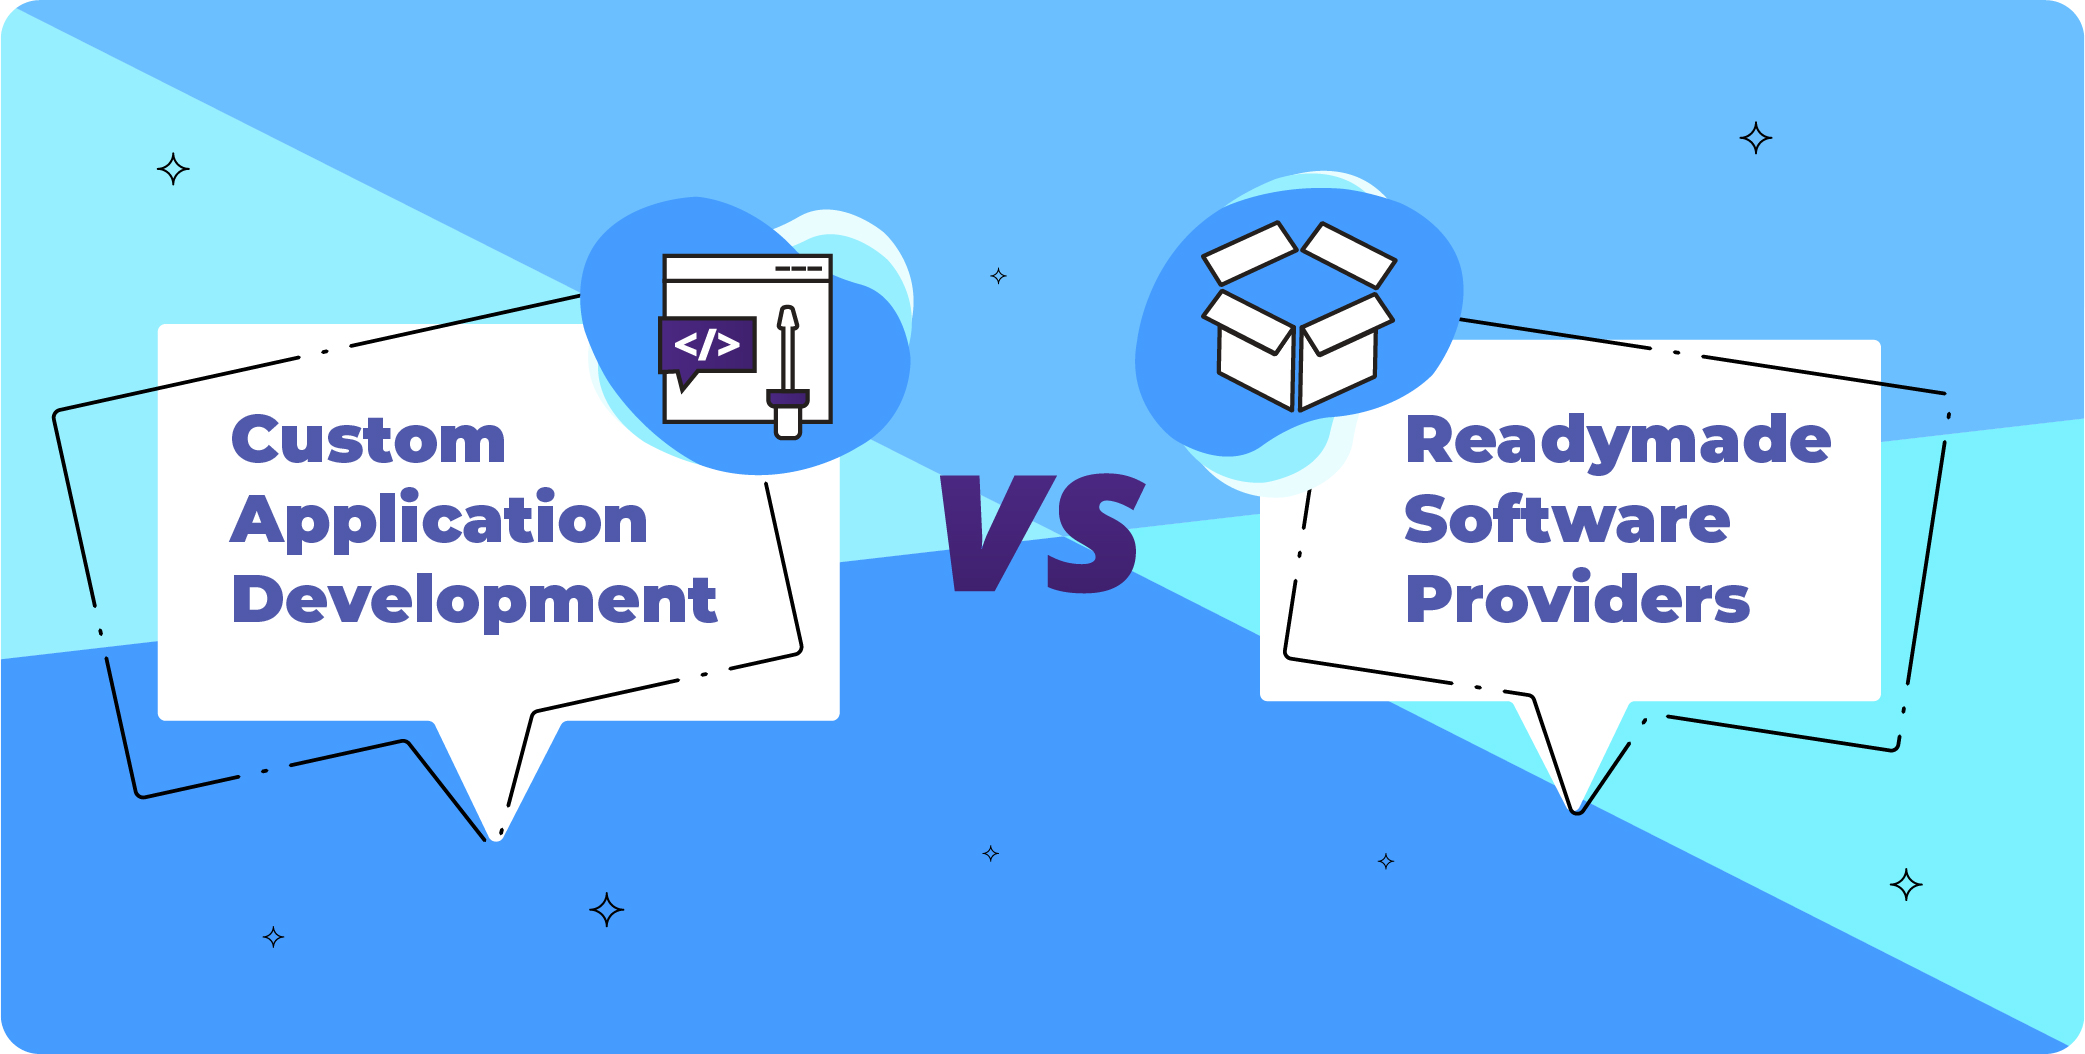 custom app development company vs readymade software title pic